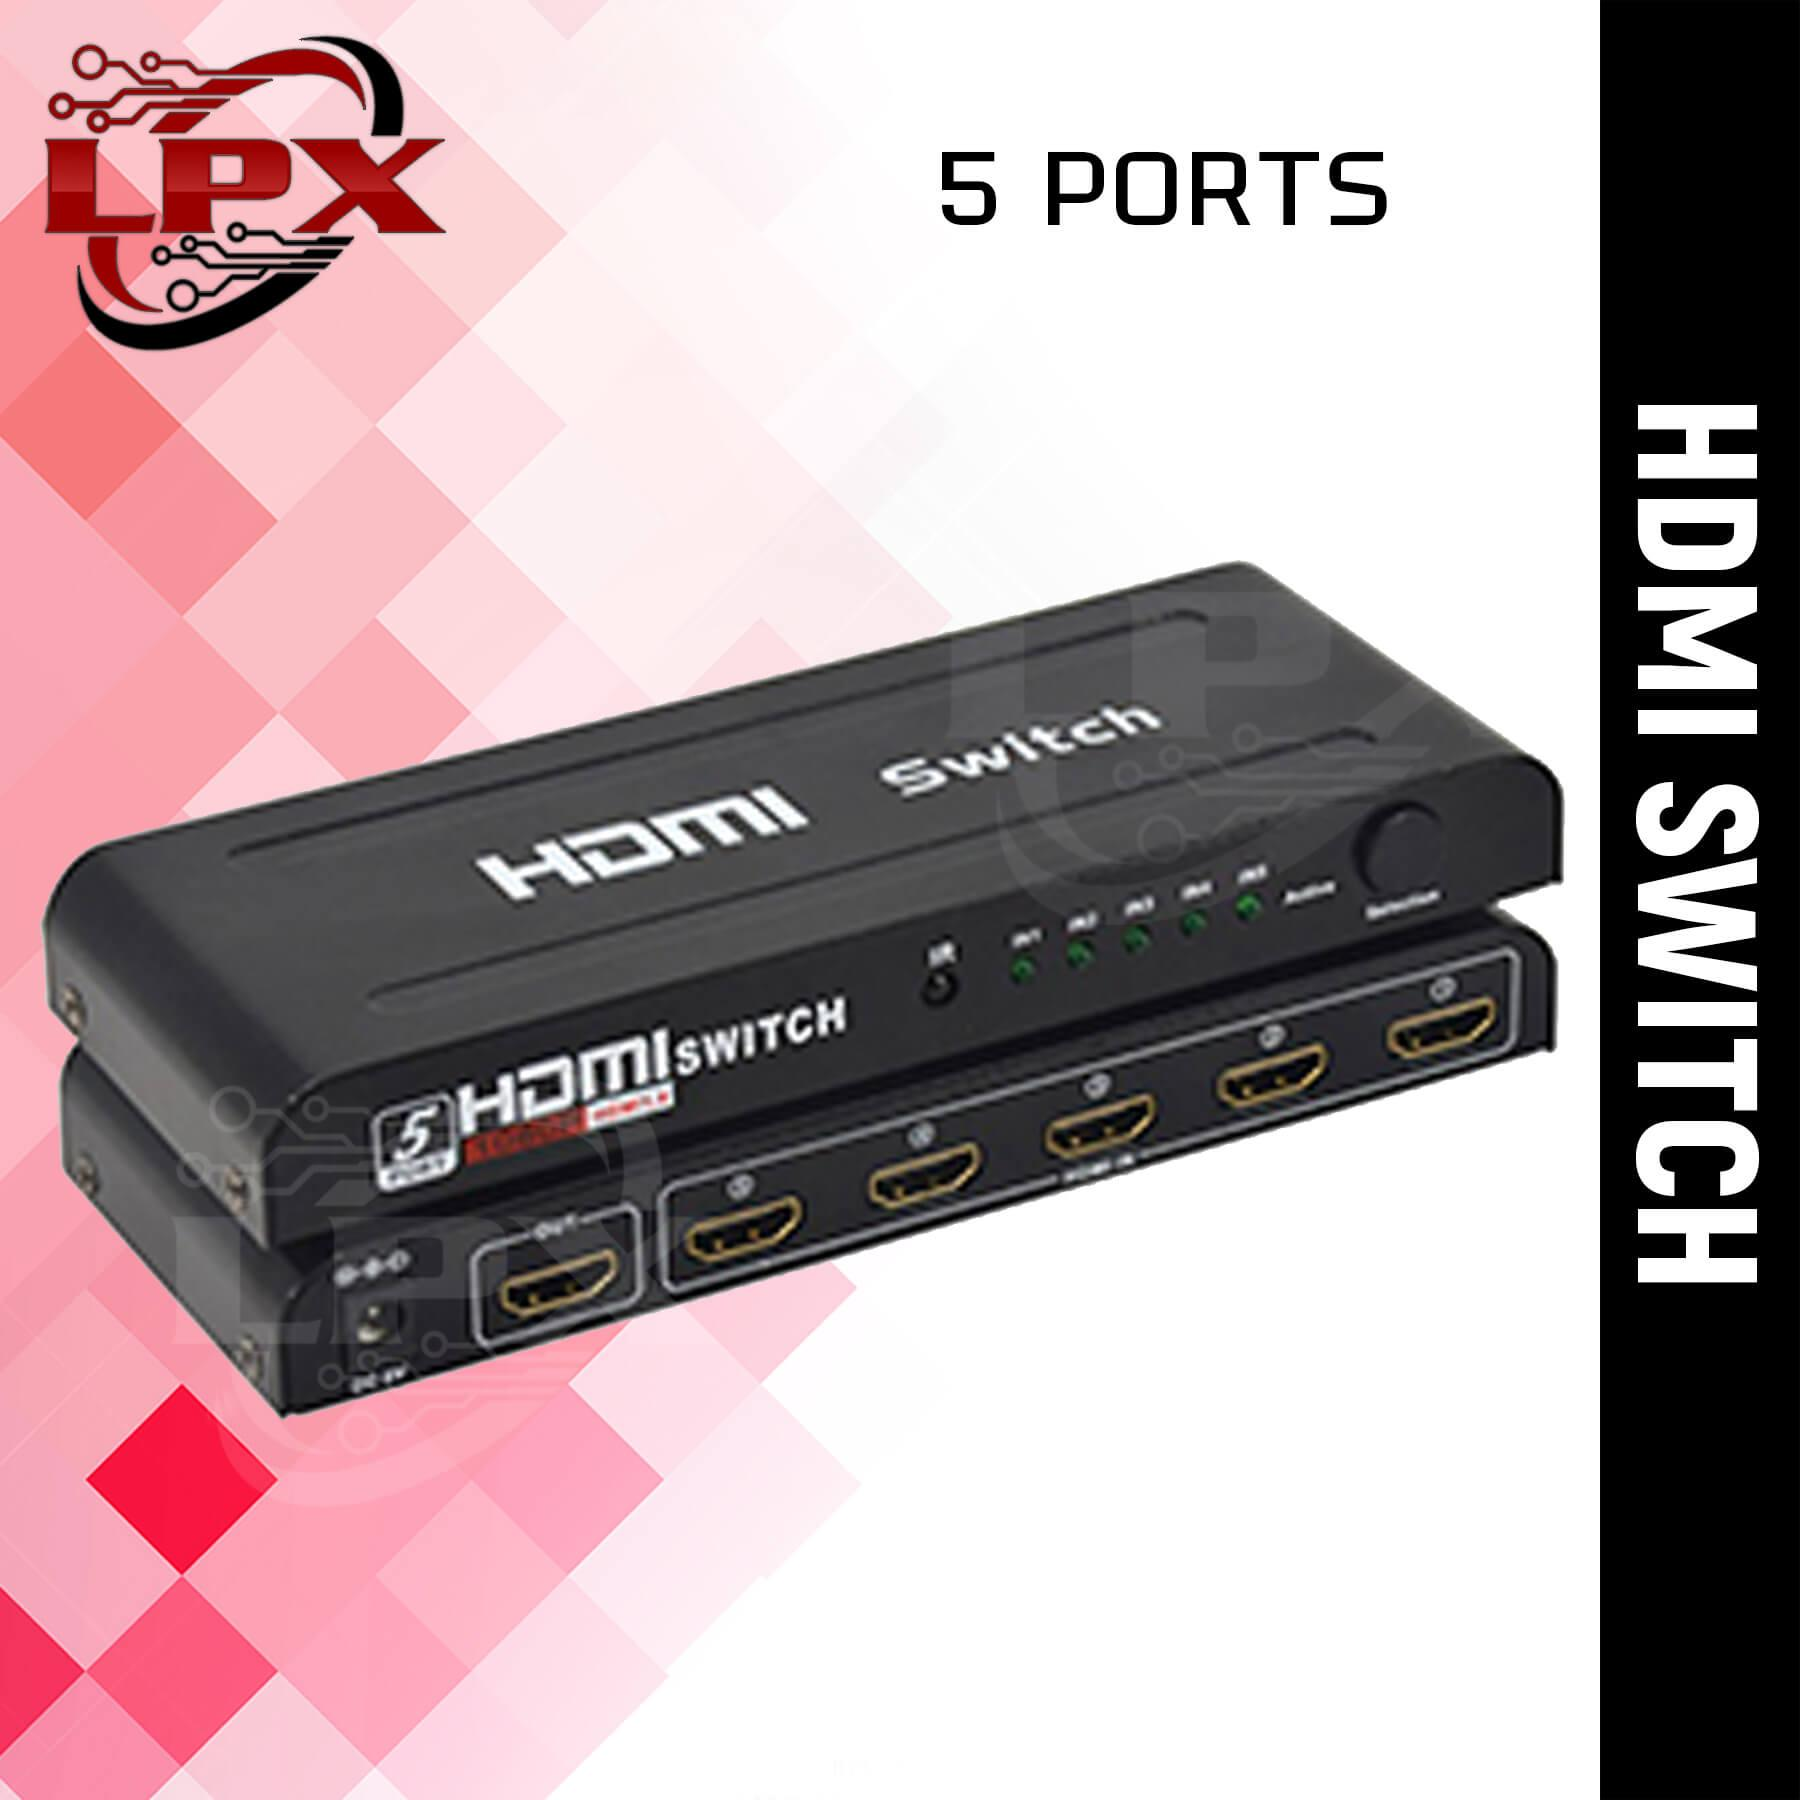 Fj Gear Philippines Price List Vga Splitter For Sale Lazada 4 Way Hdmi Kvm Switch 1080p Full Hd 3 Port Switcher Hub With Remote Control